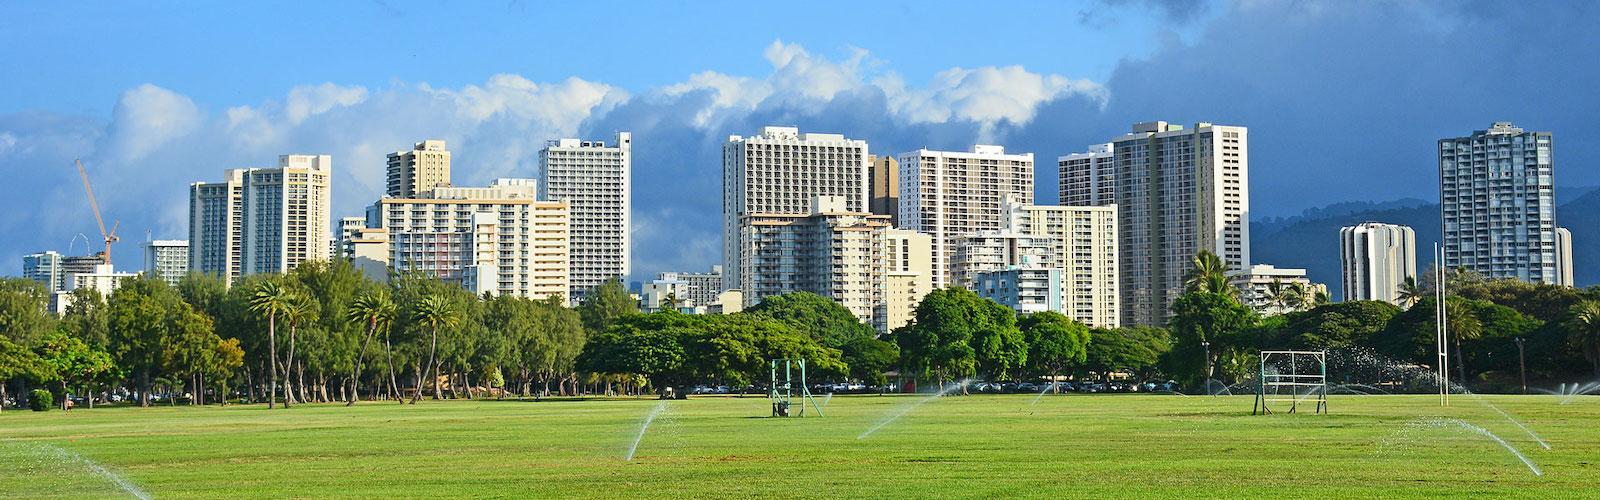 Waikiki, Quiet End of Town, Where to Stay in Waikiki, About Waikiki, Oahu, Hawaii